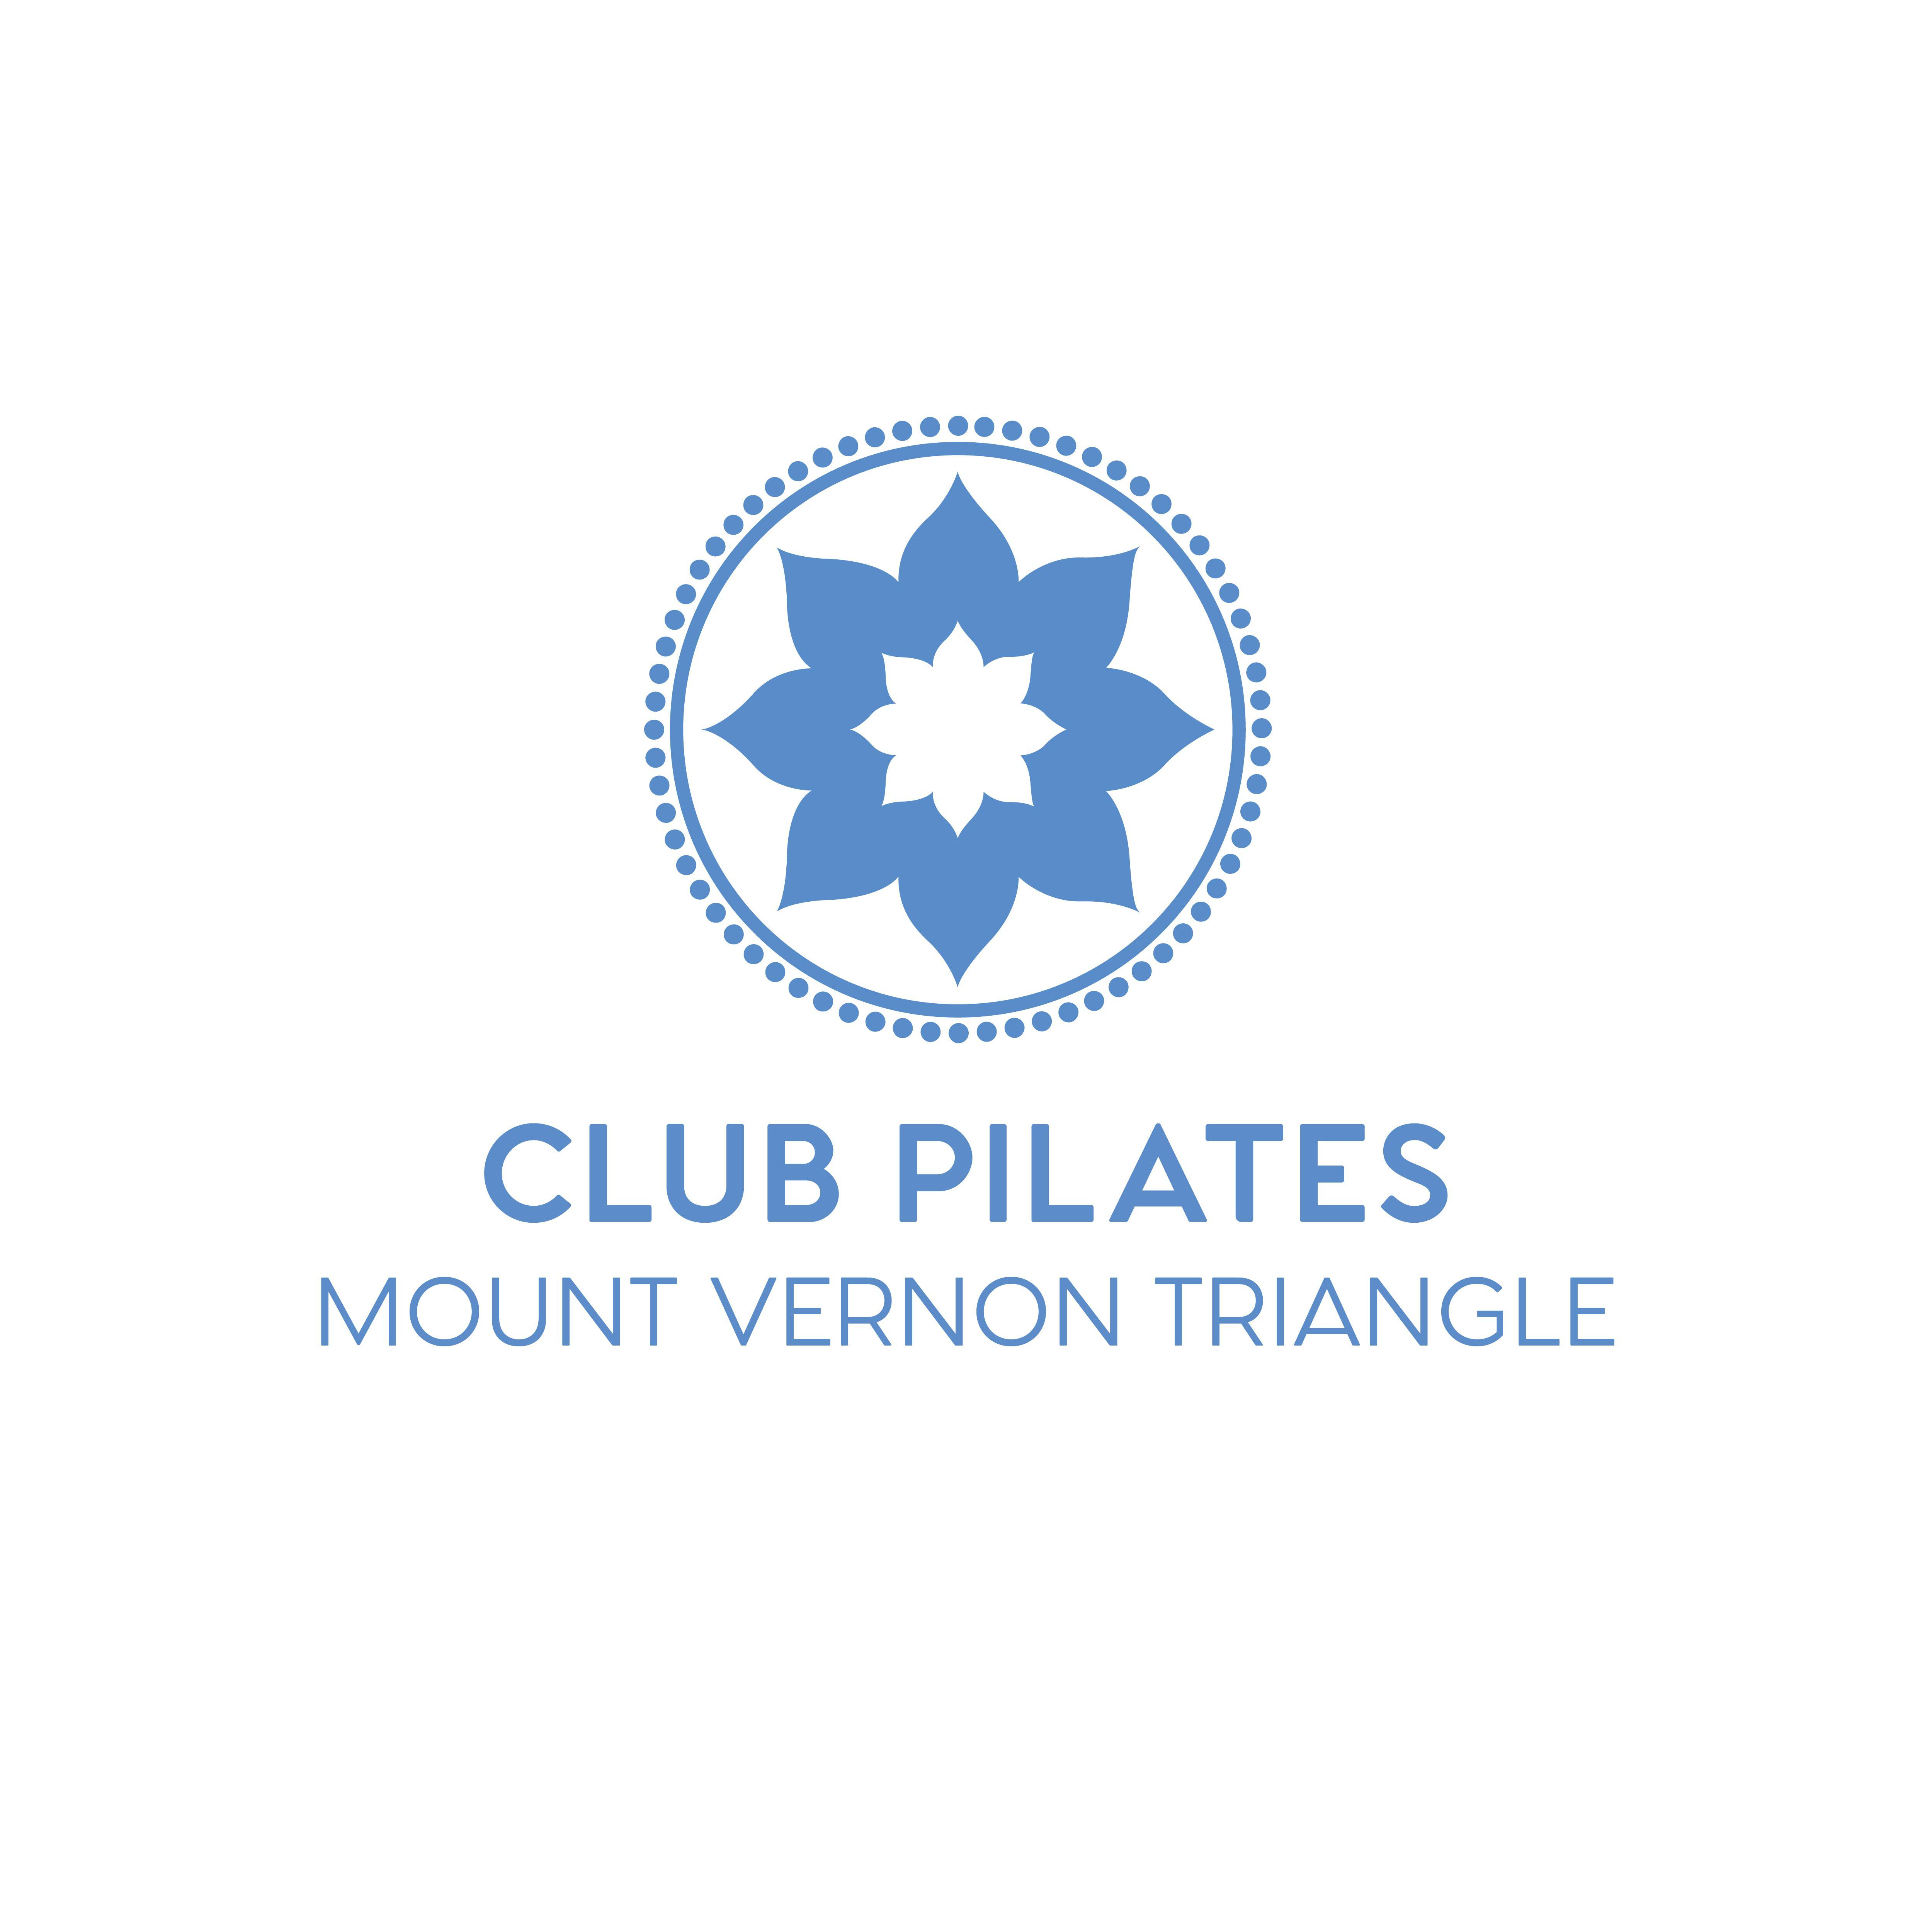 Club Pilates image 1